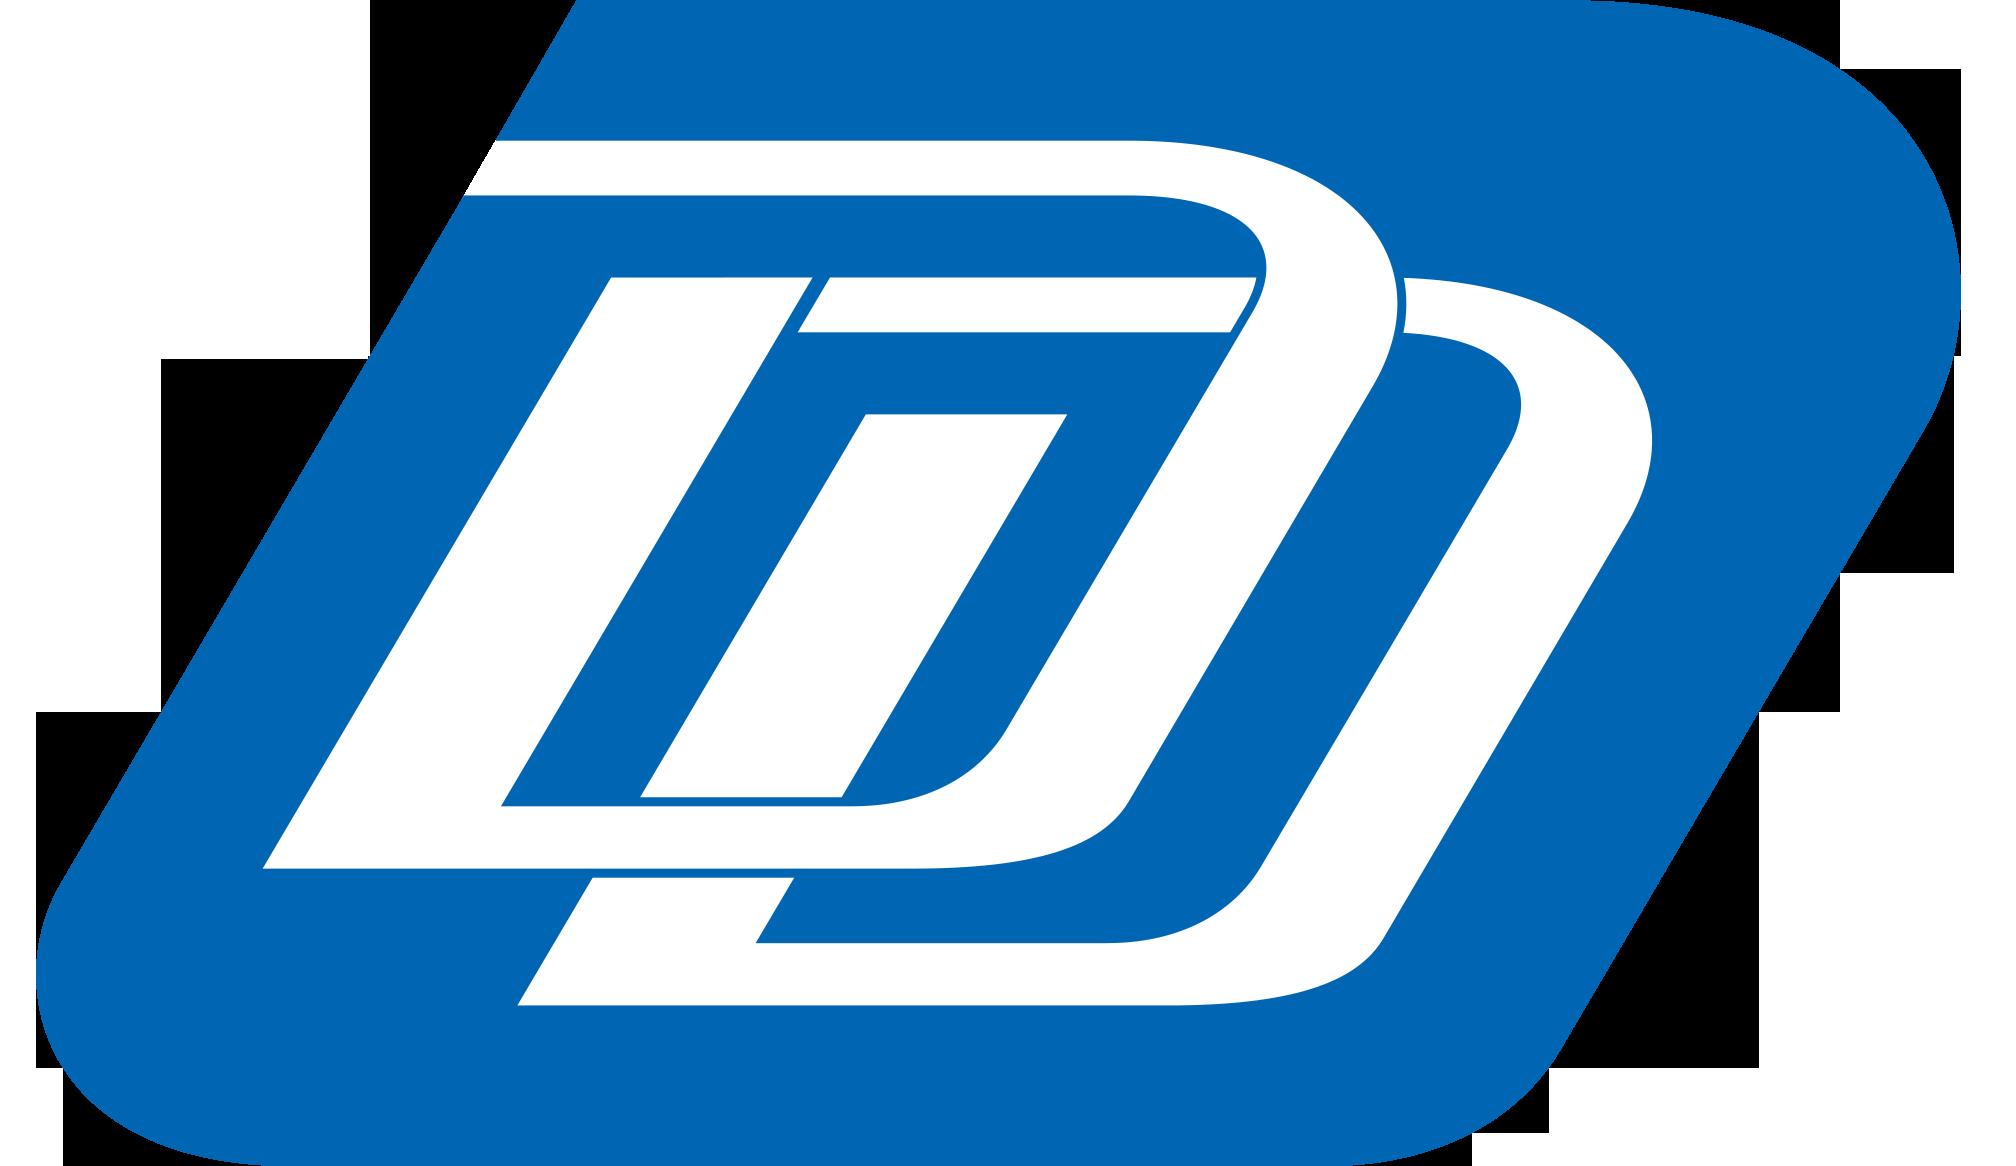 DanaDynamics - Autonomous Systems